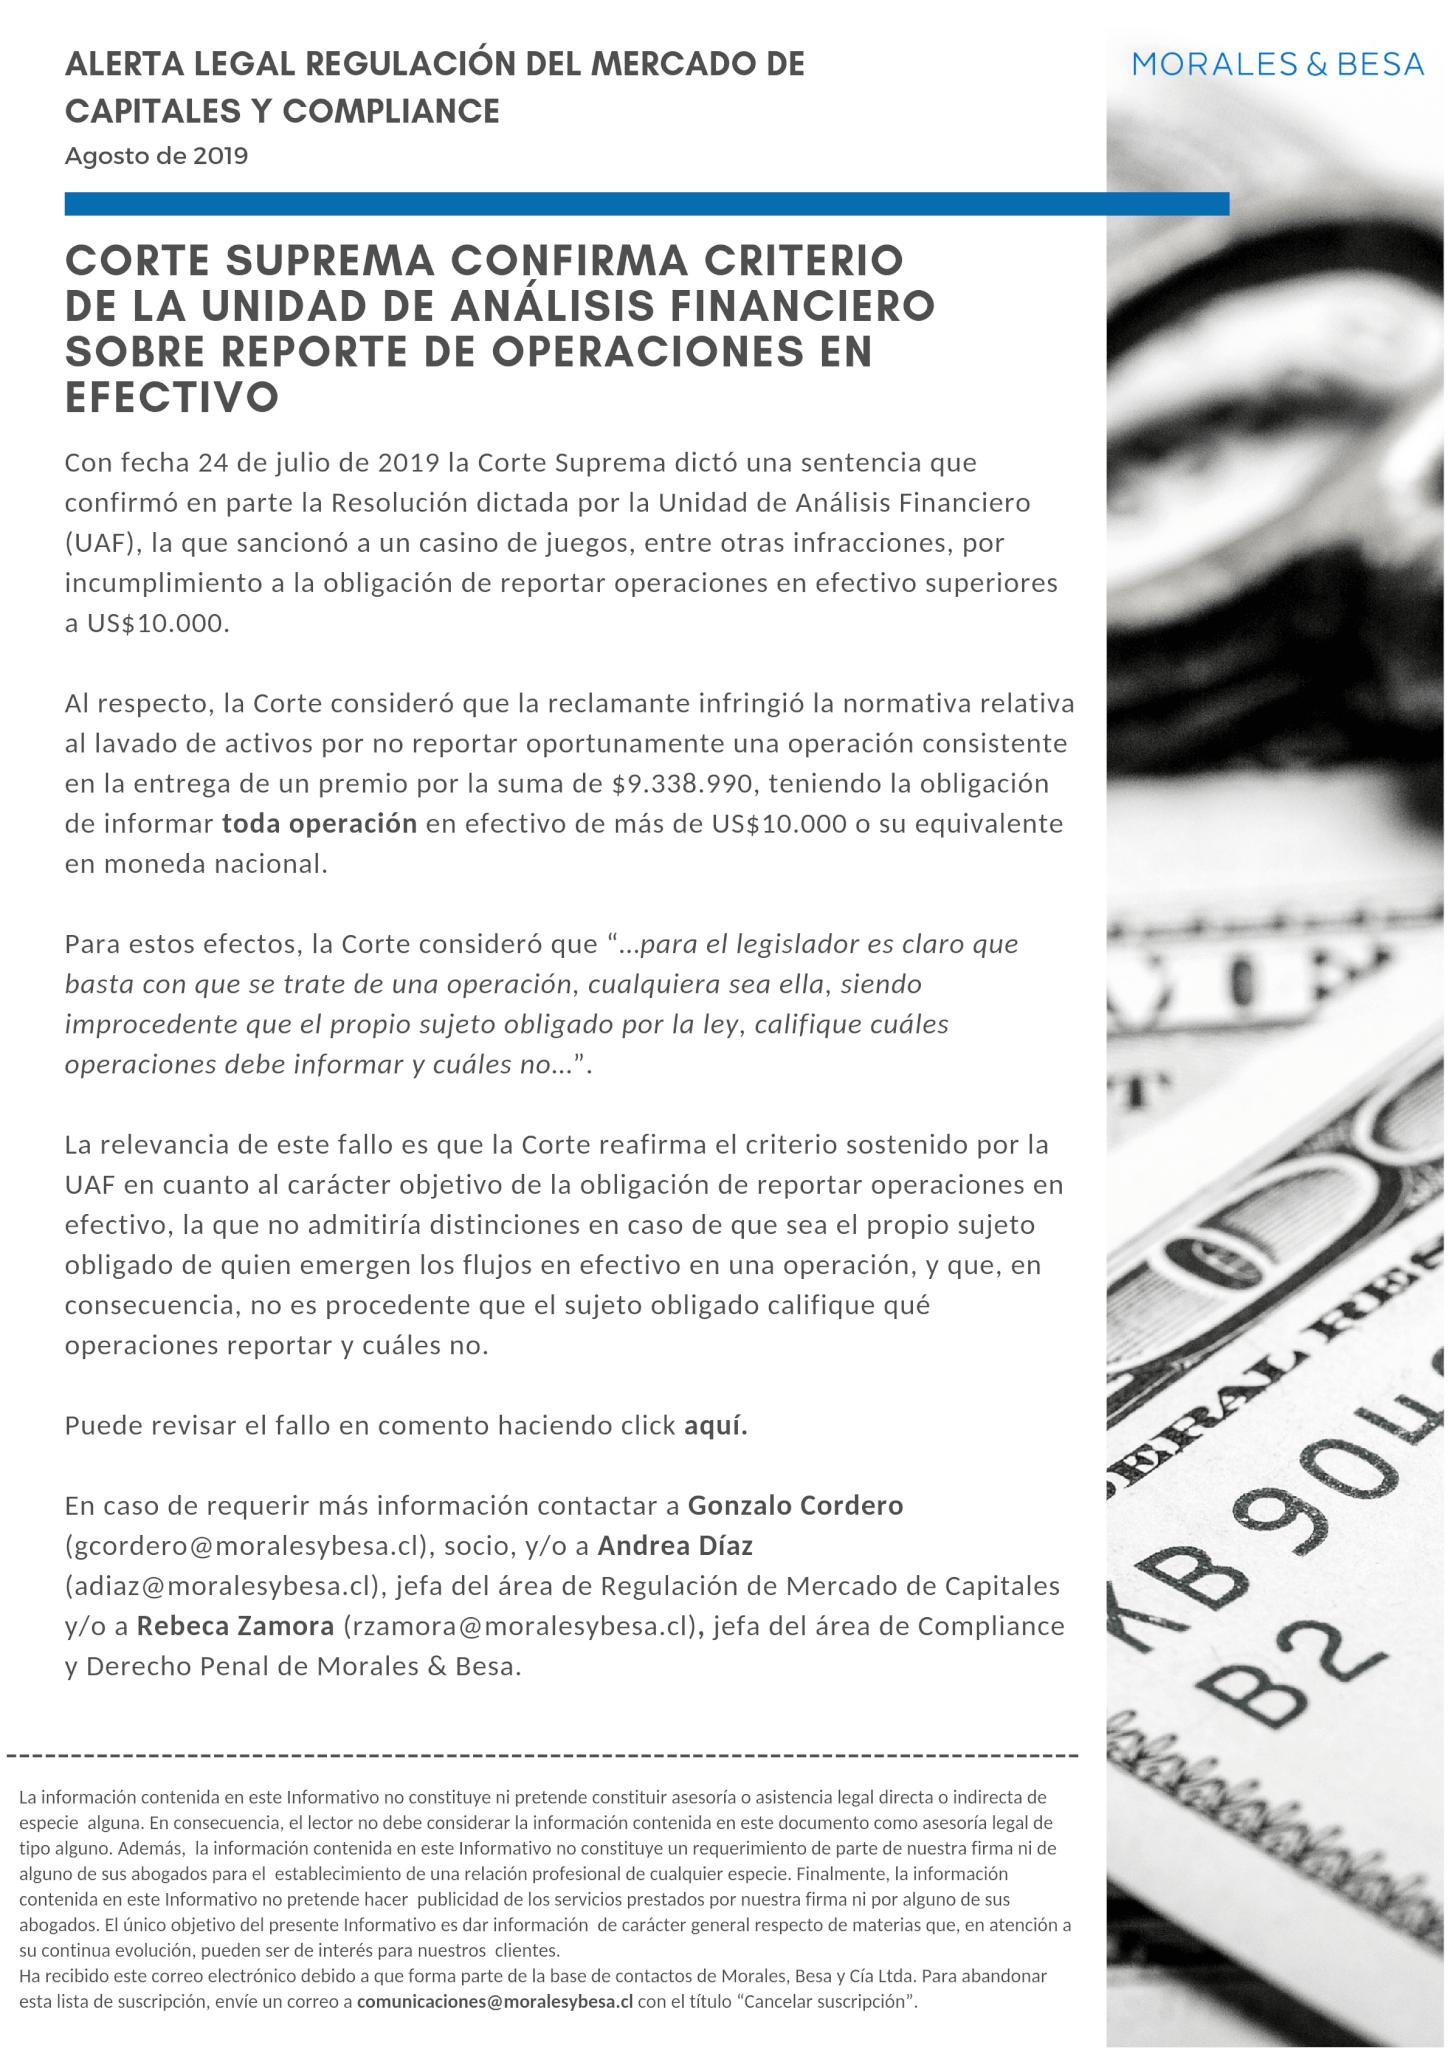 Alerta legal M&B - Agosto de 2019